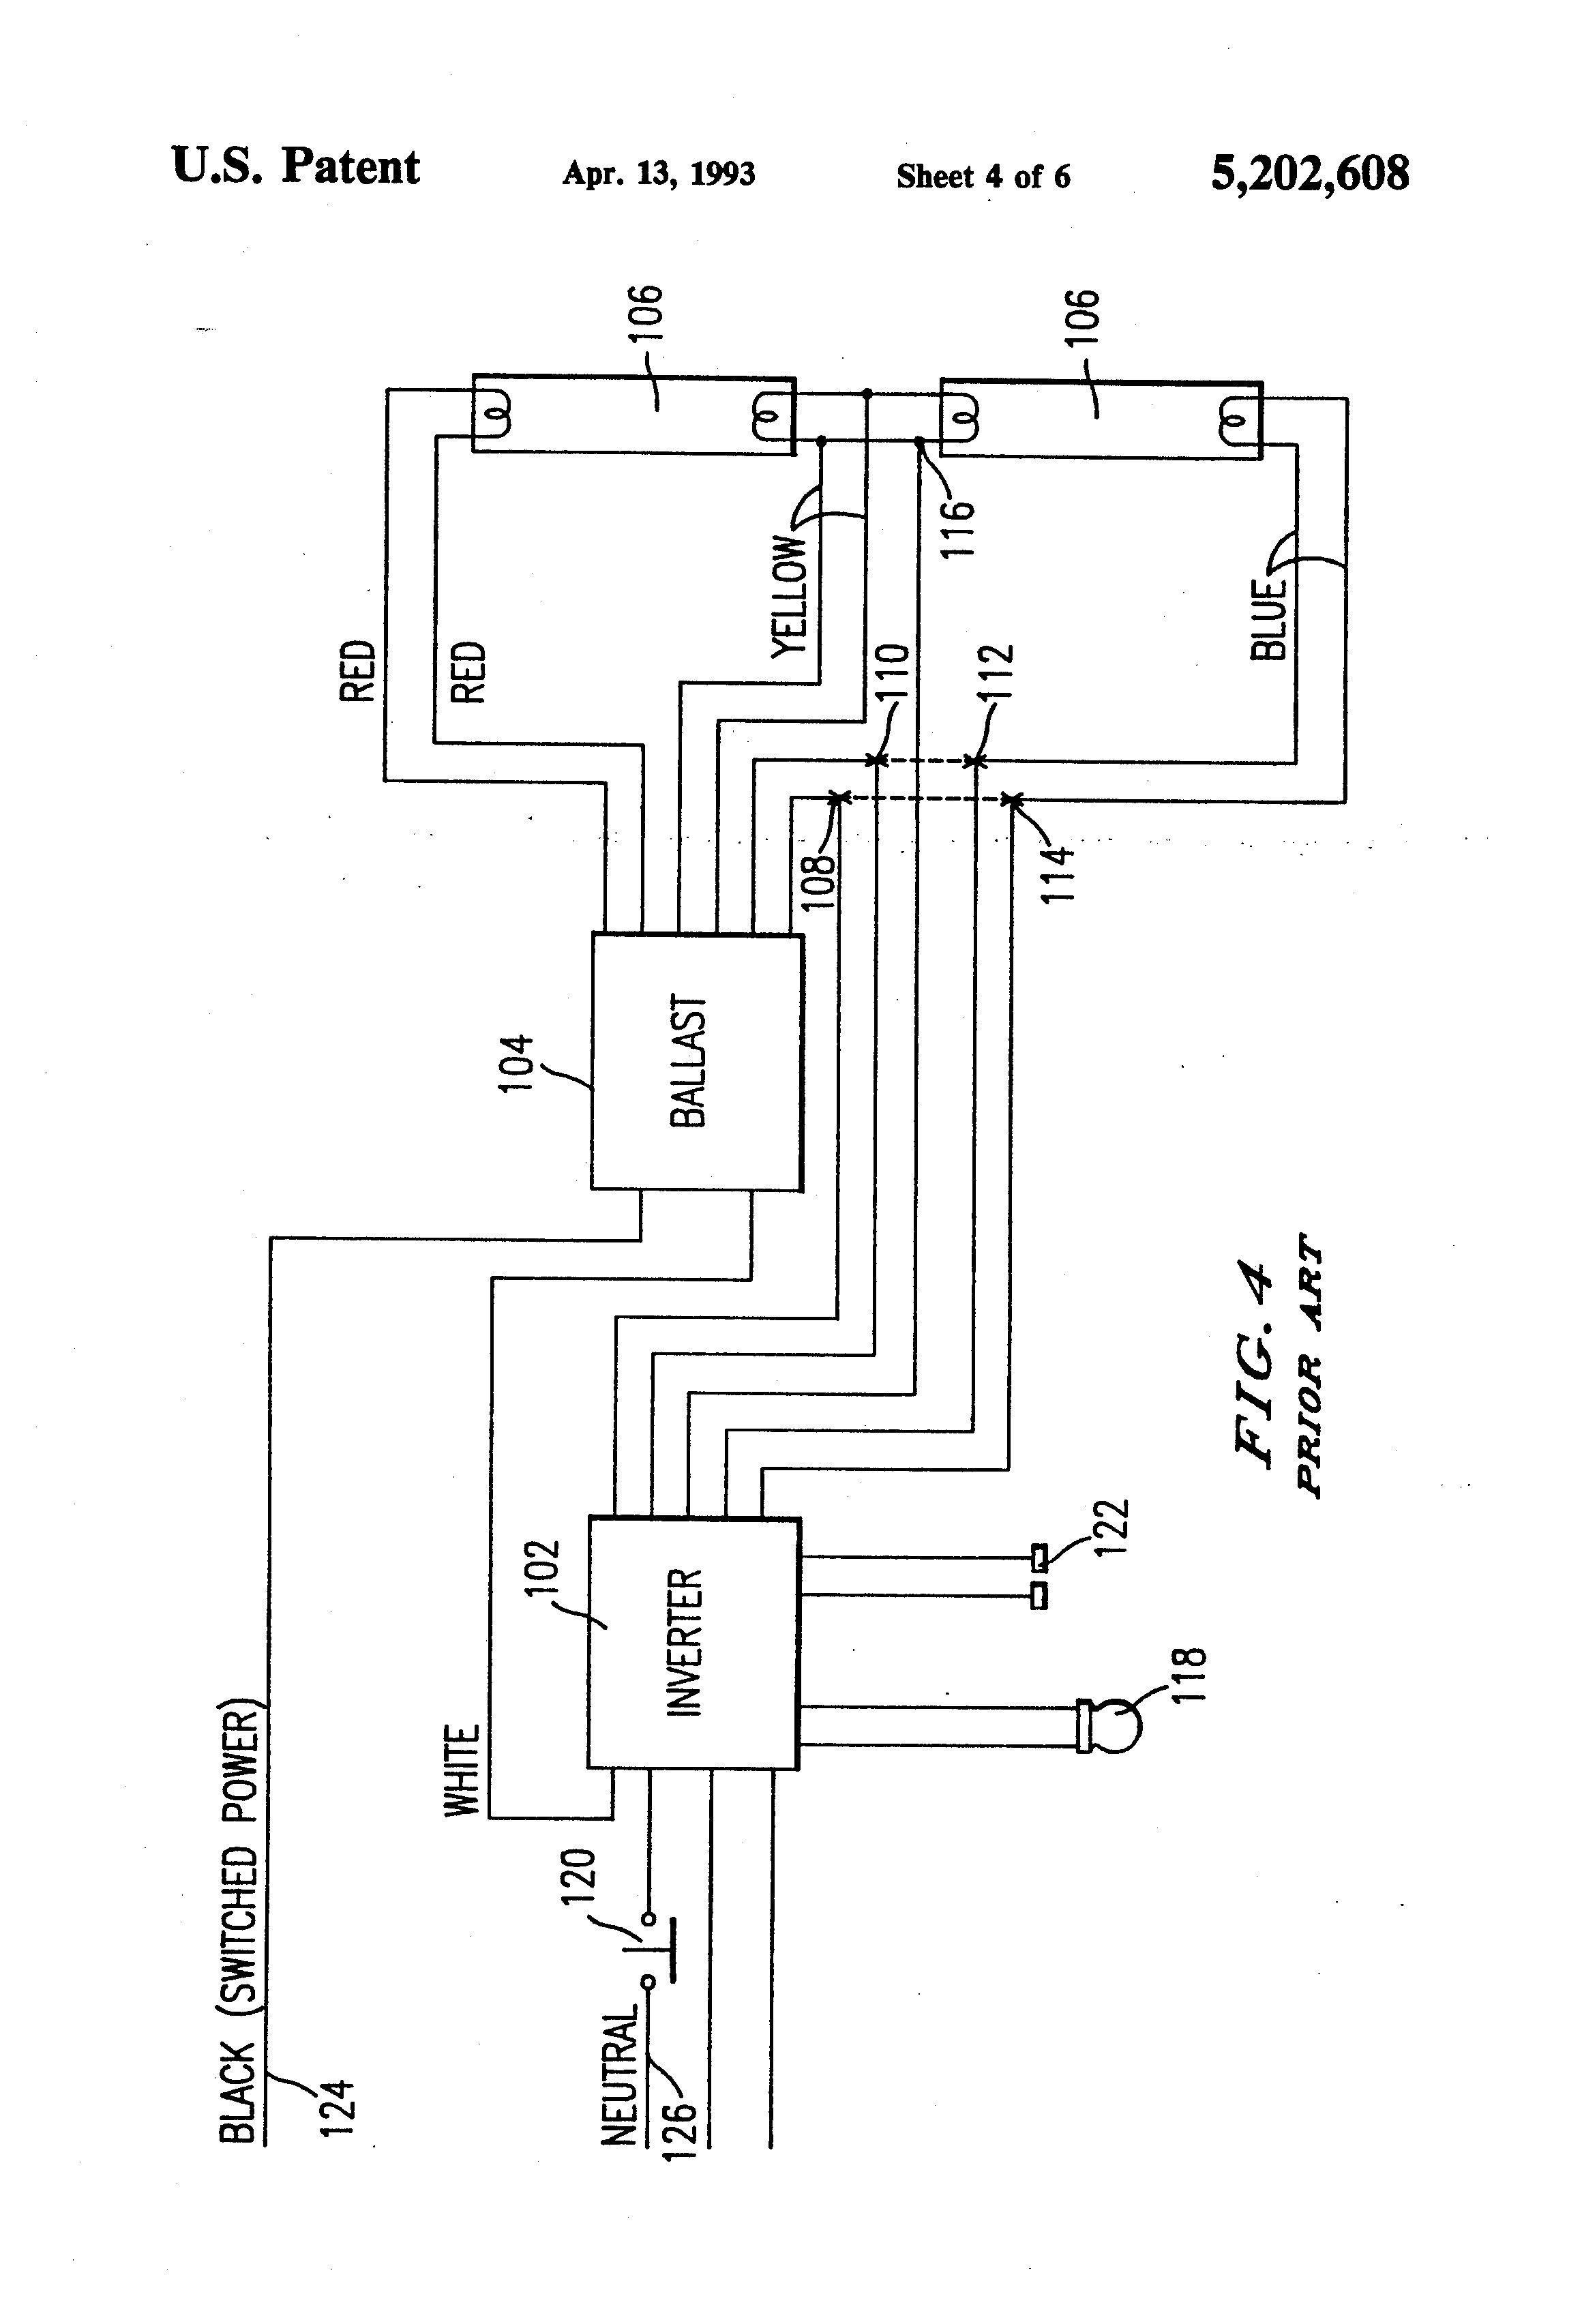 hps ballast wiring diagram new in 2020  lighting diagram